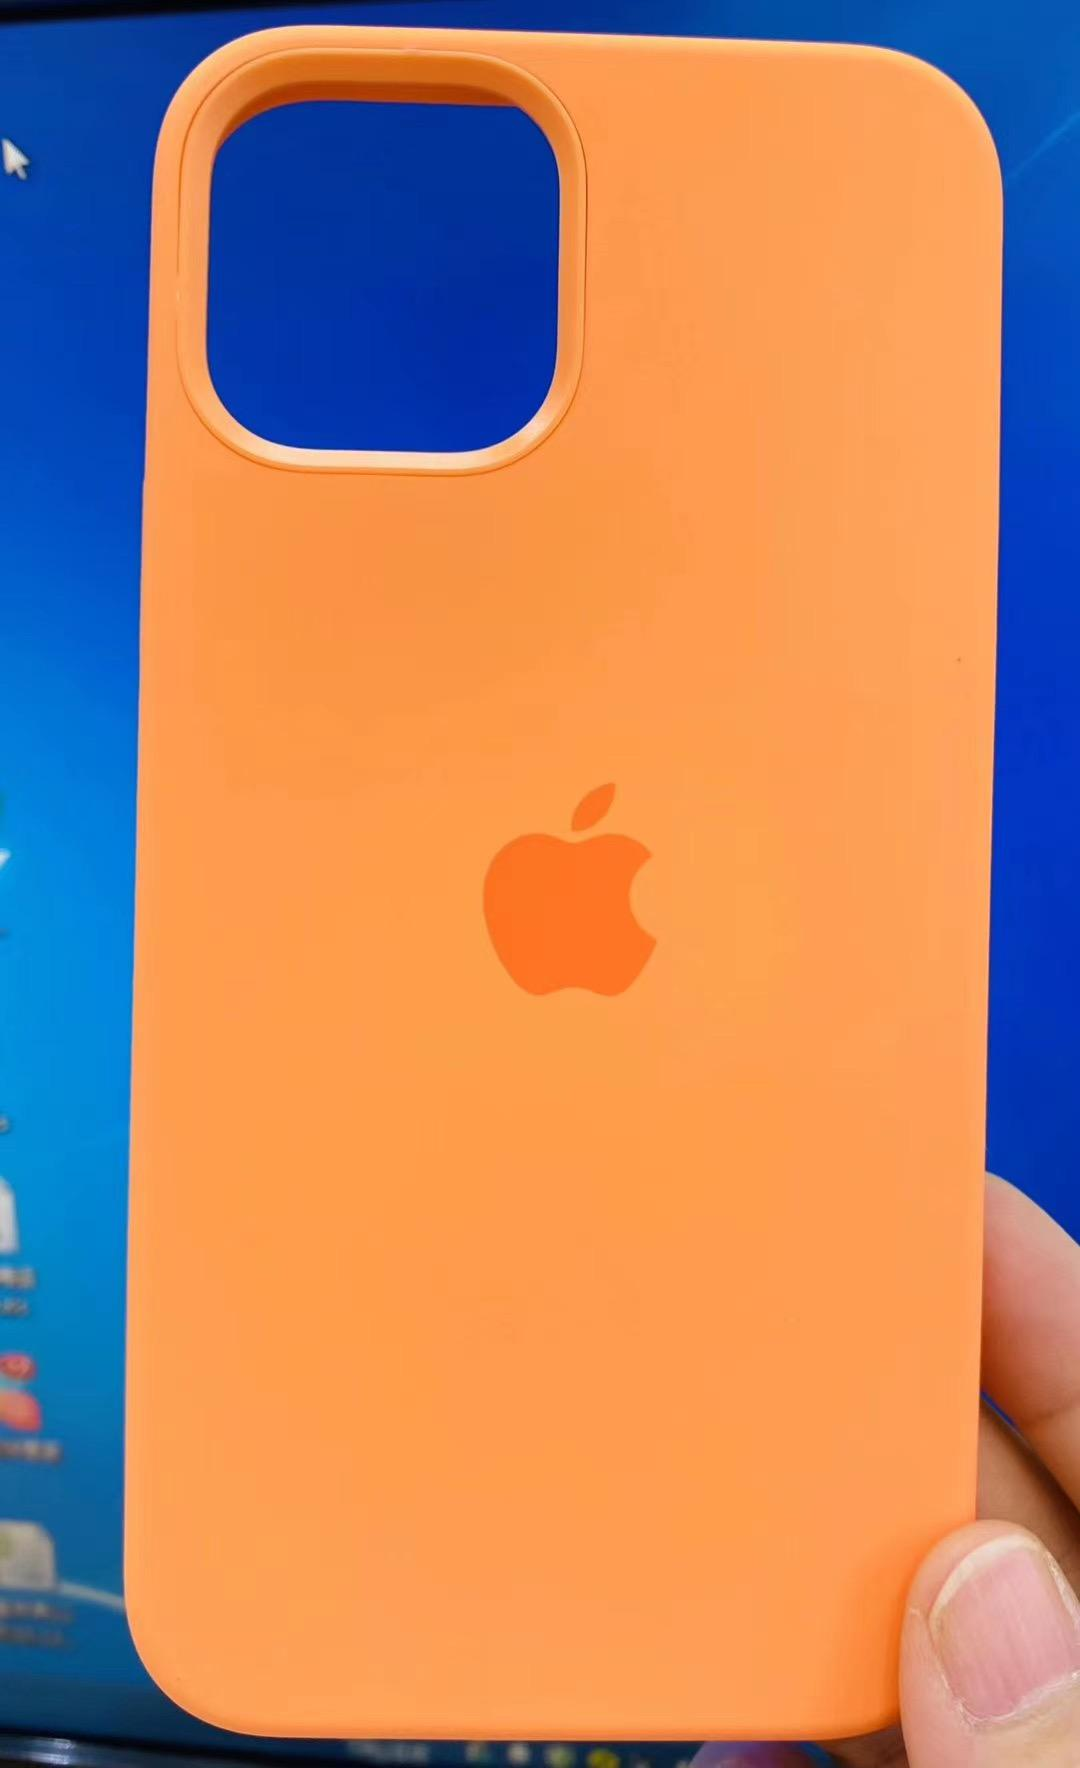 Apple phone case for iphone 12 pro max 12 mini 11 pro max  xs max xr 7 8plus 4